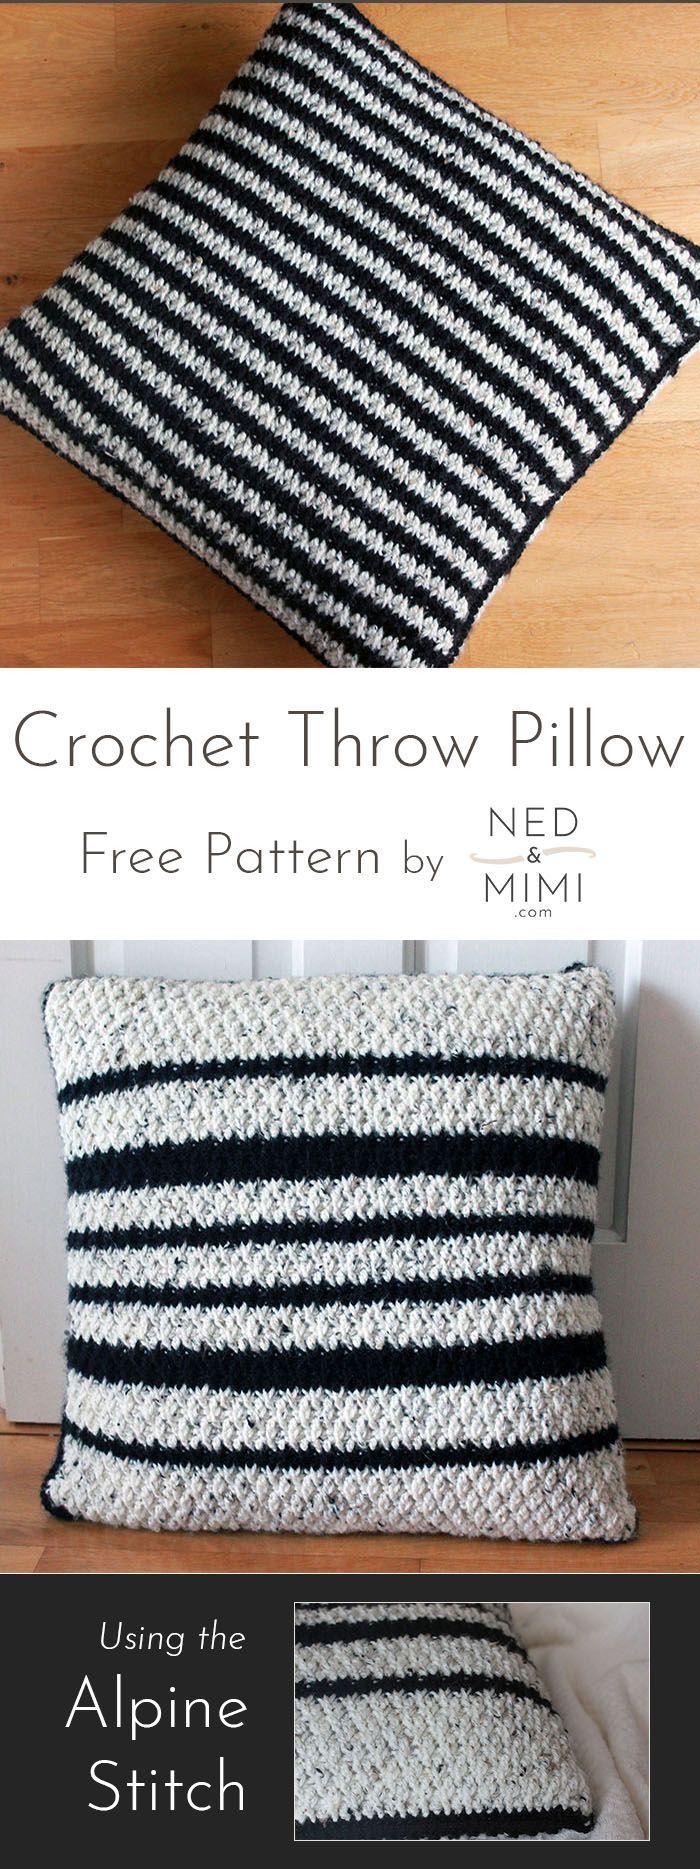 Black White Ned Mimi Crochet Cushion Pattern Crochet Pillow Patterns Free Crochet Pillow Pattern